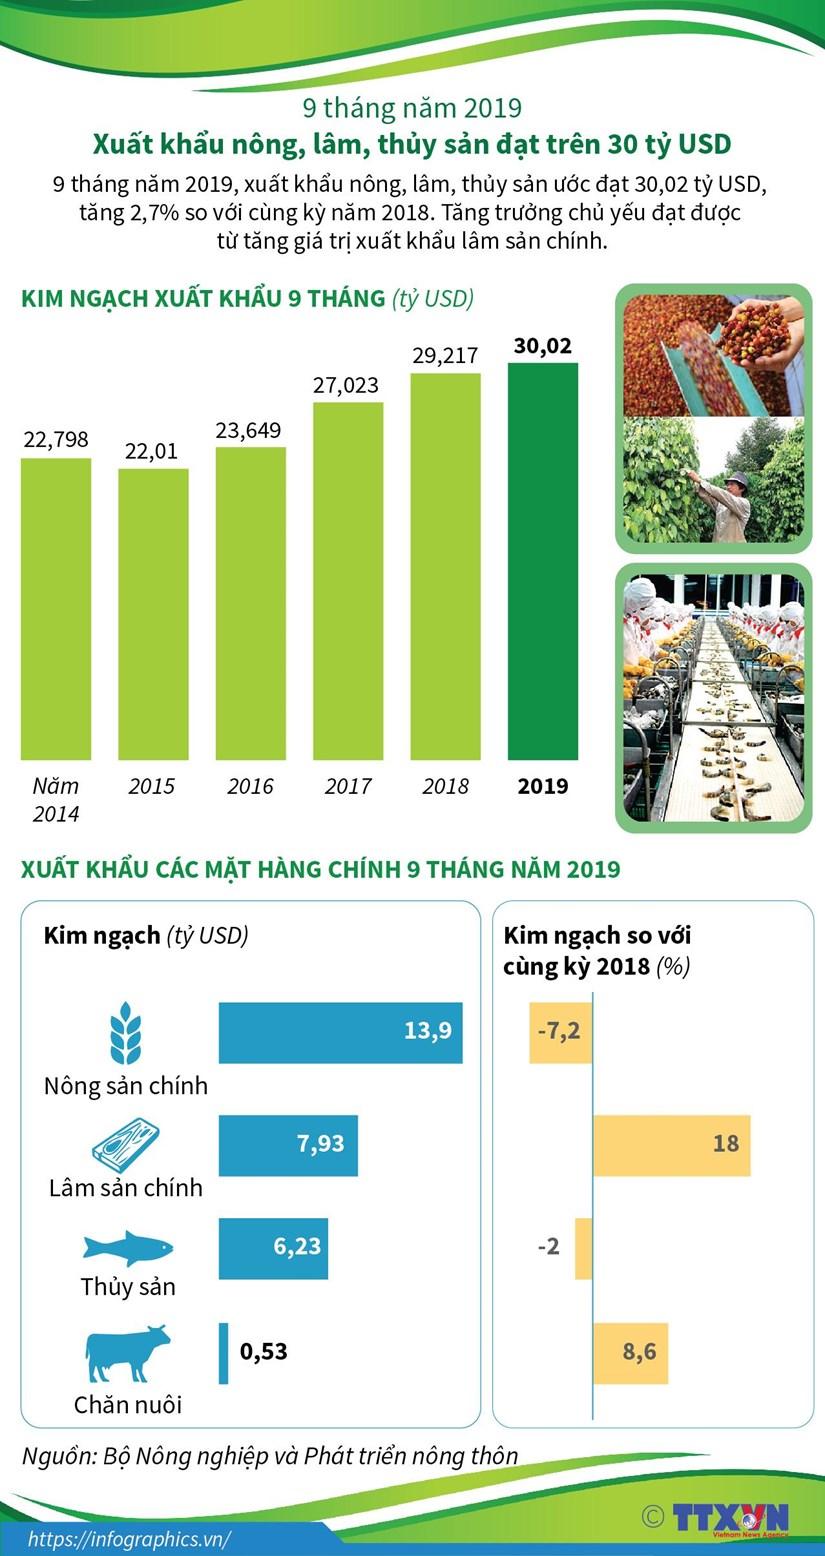 [Infographics] Xuat khau nong, lam, thuy san 9 thang dat 30 ty USD hinh anh 1